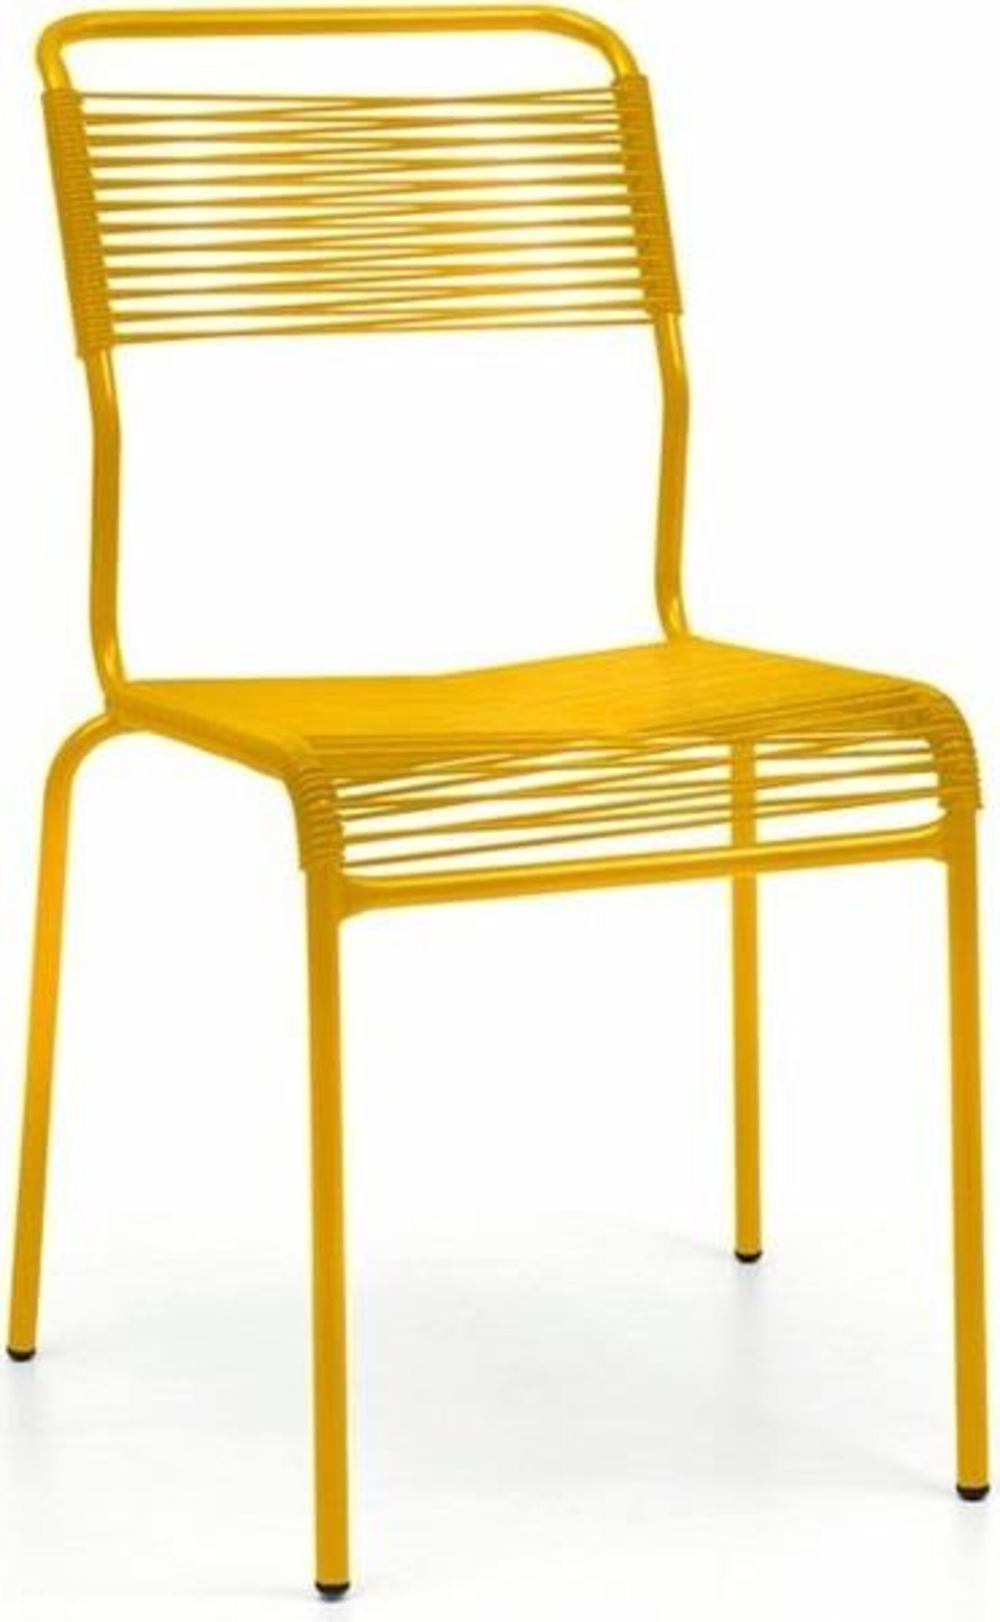 Santis Spaghetti Gartenstuhle Stuhle Gartentisch